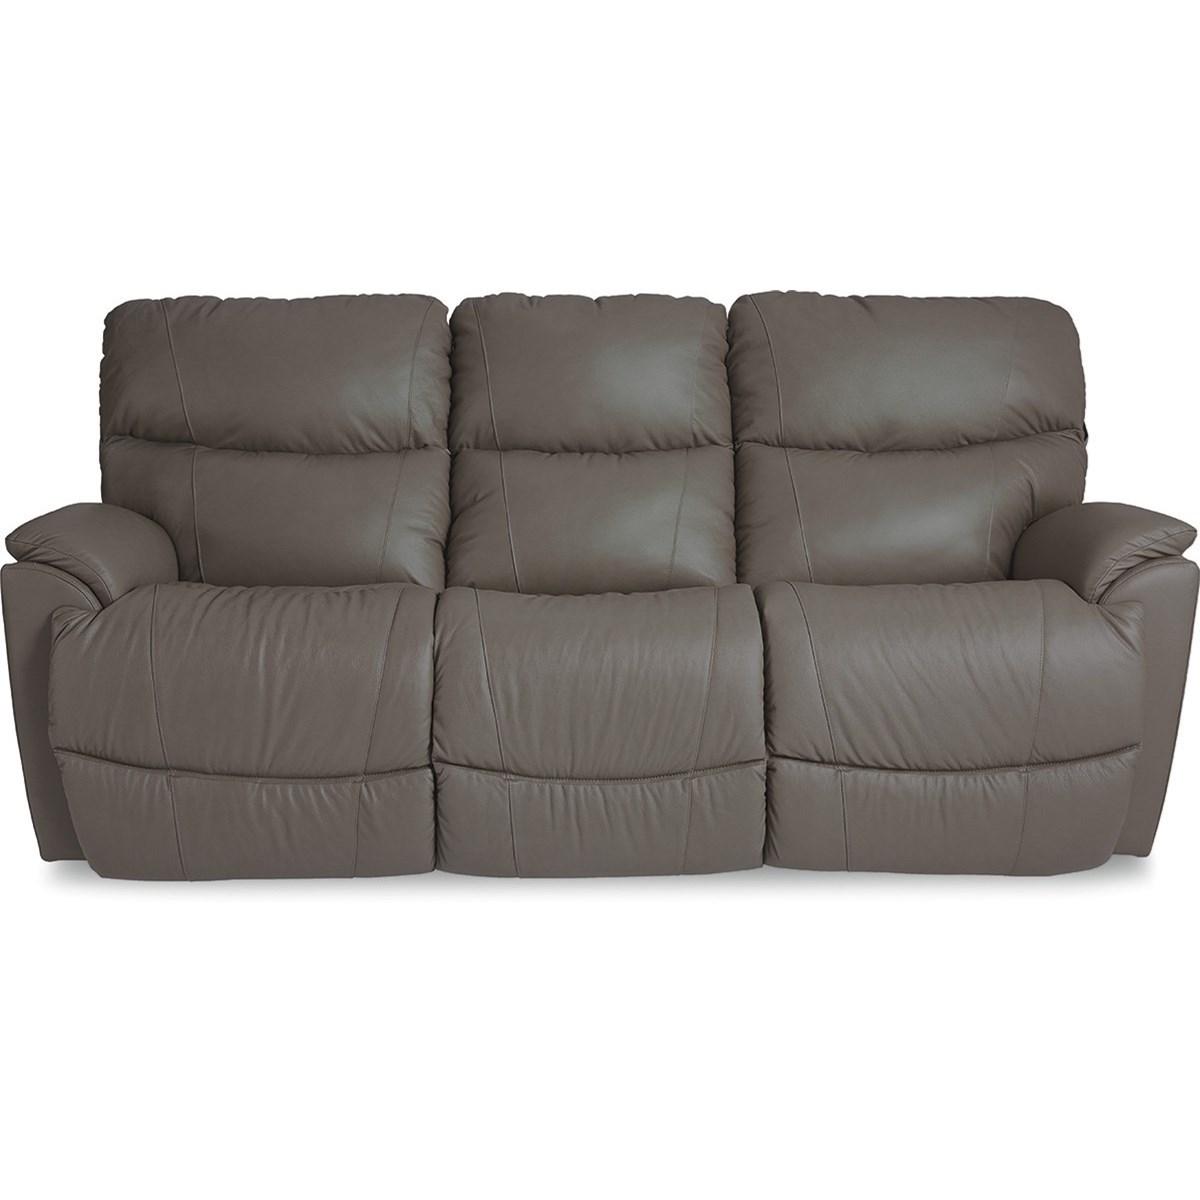 Trouper Reclining Sofa by La-Z-Boy at Bennett's Furniture and Mattresses